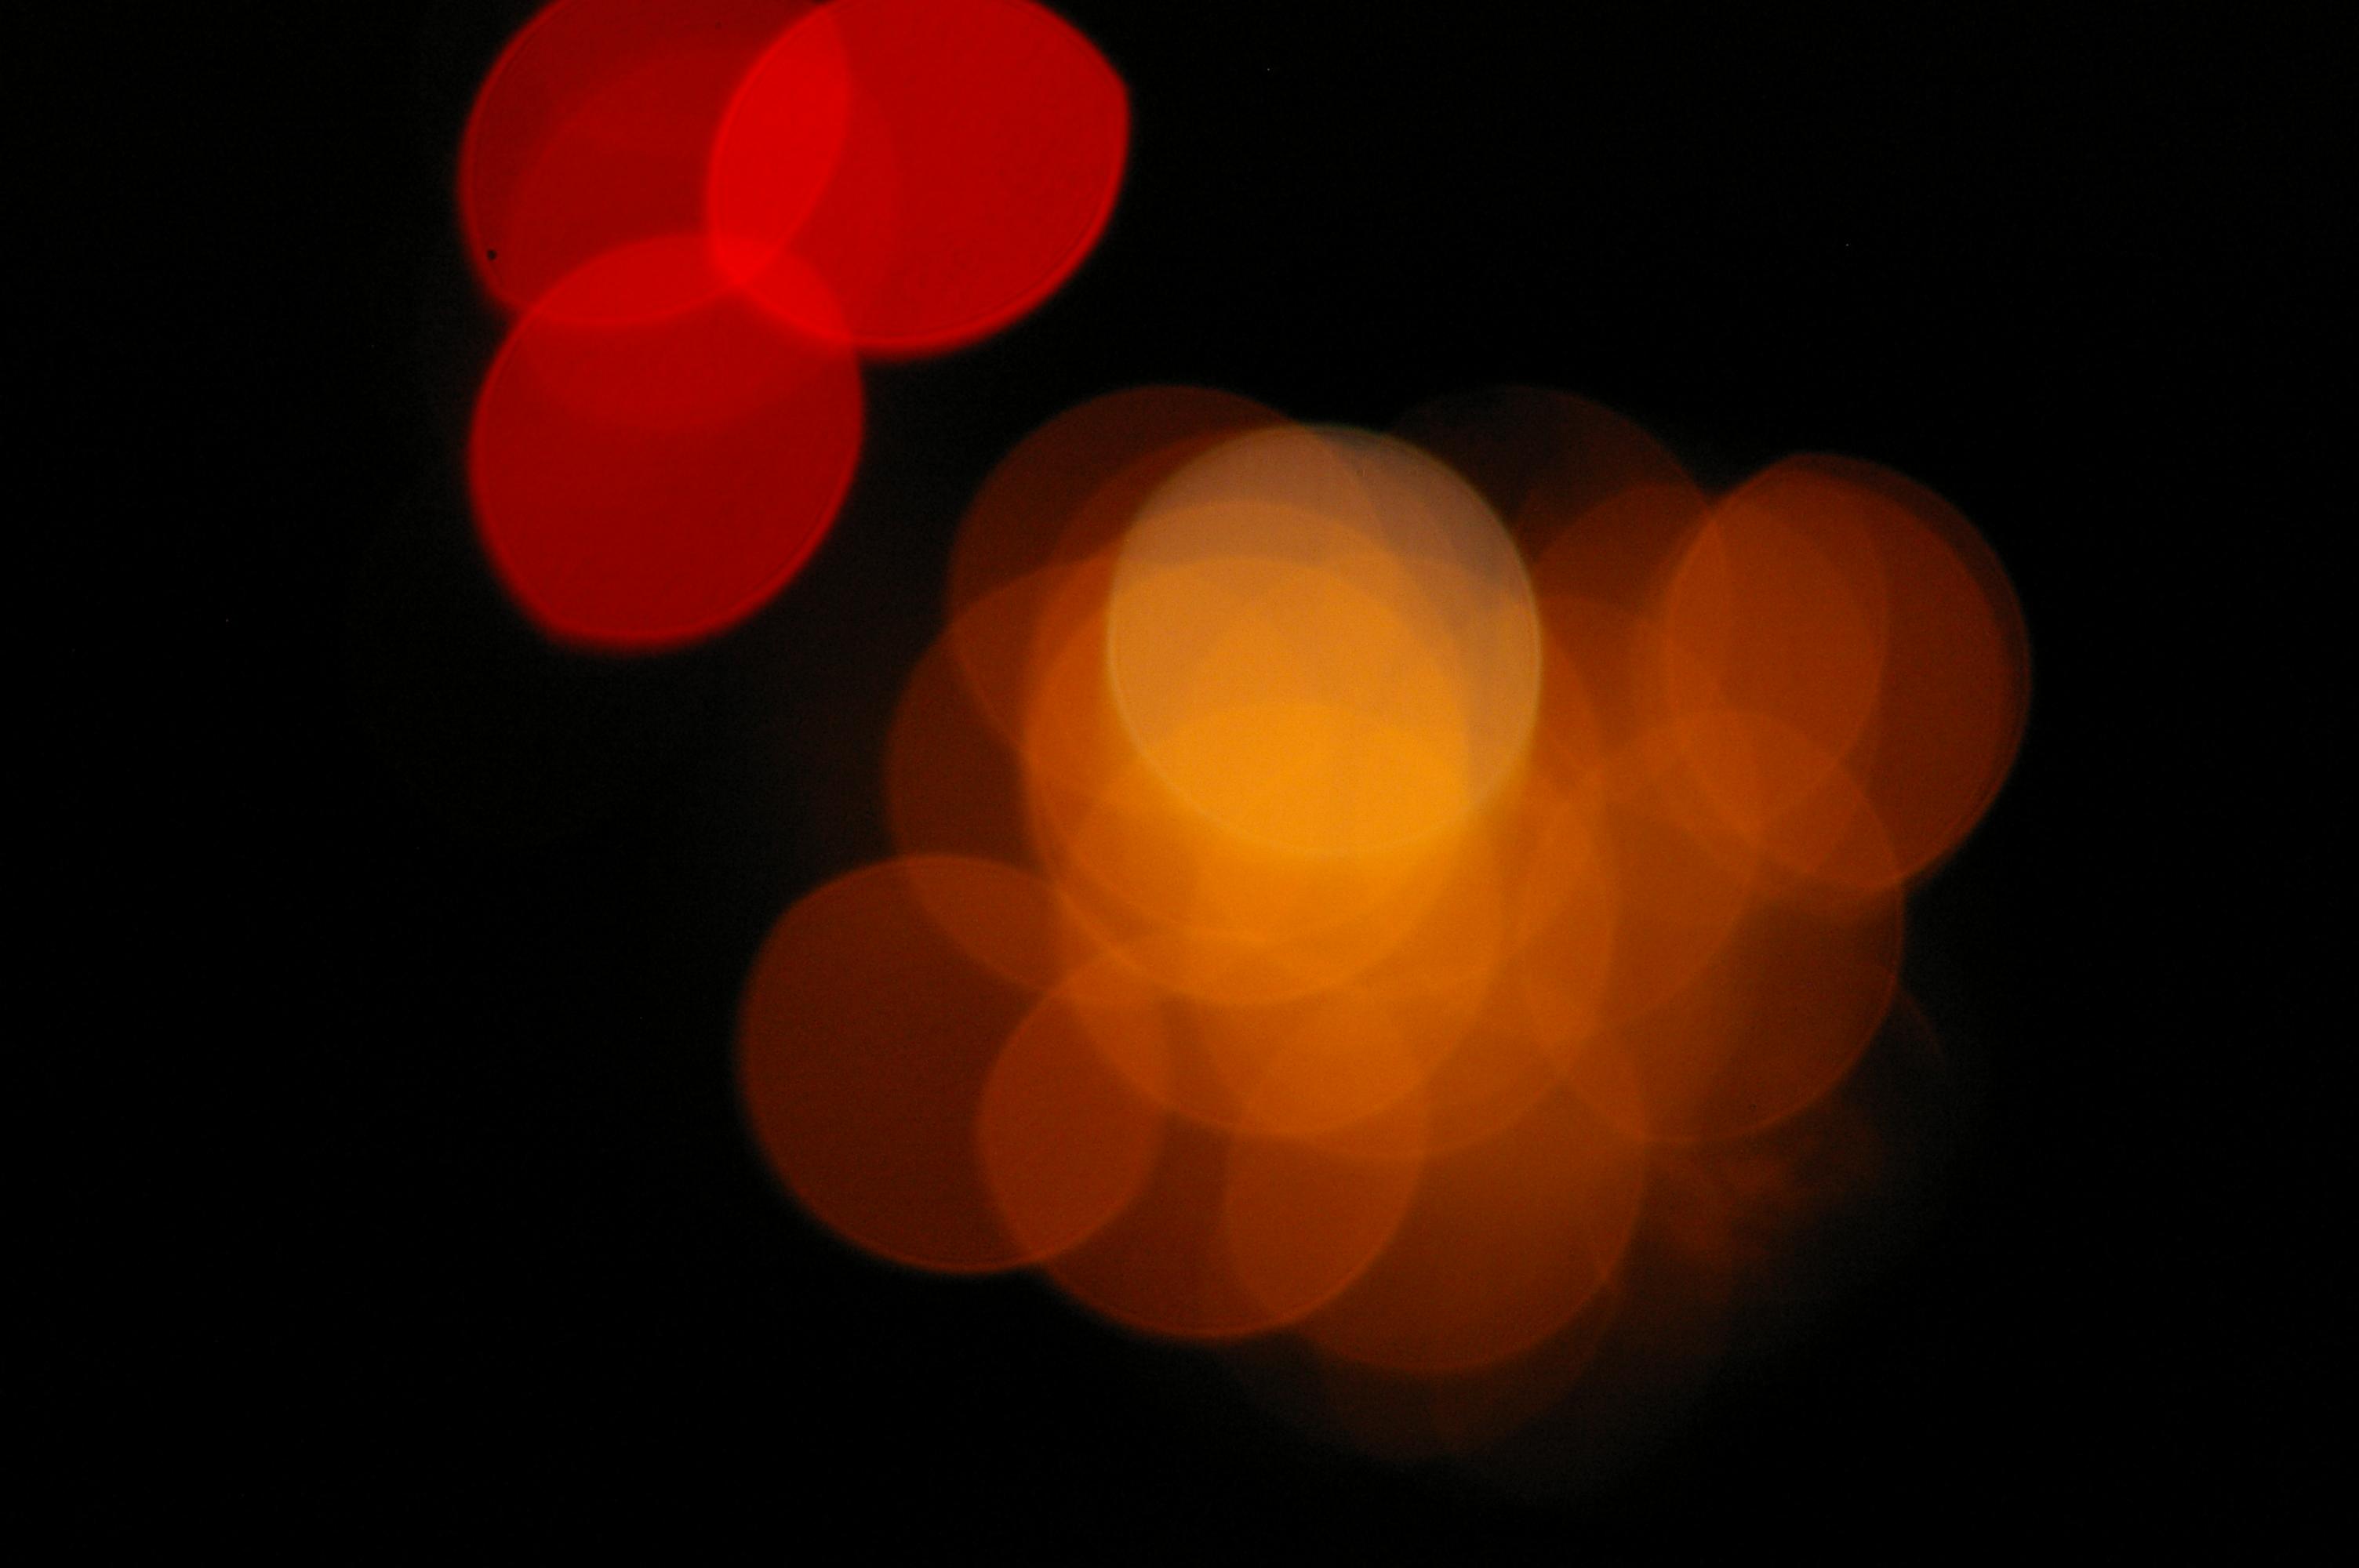 Light effects, Black, Dark, Dazed, Effect, HQ Photo